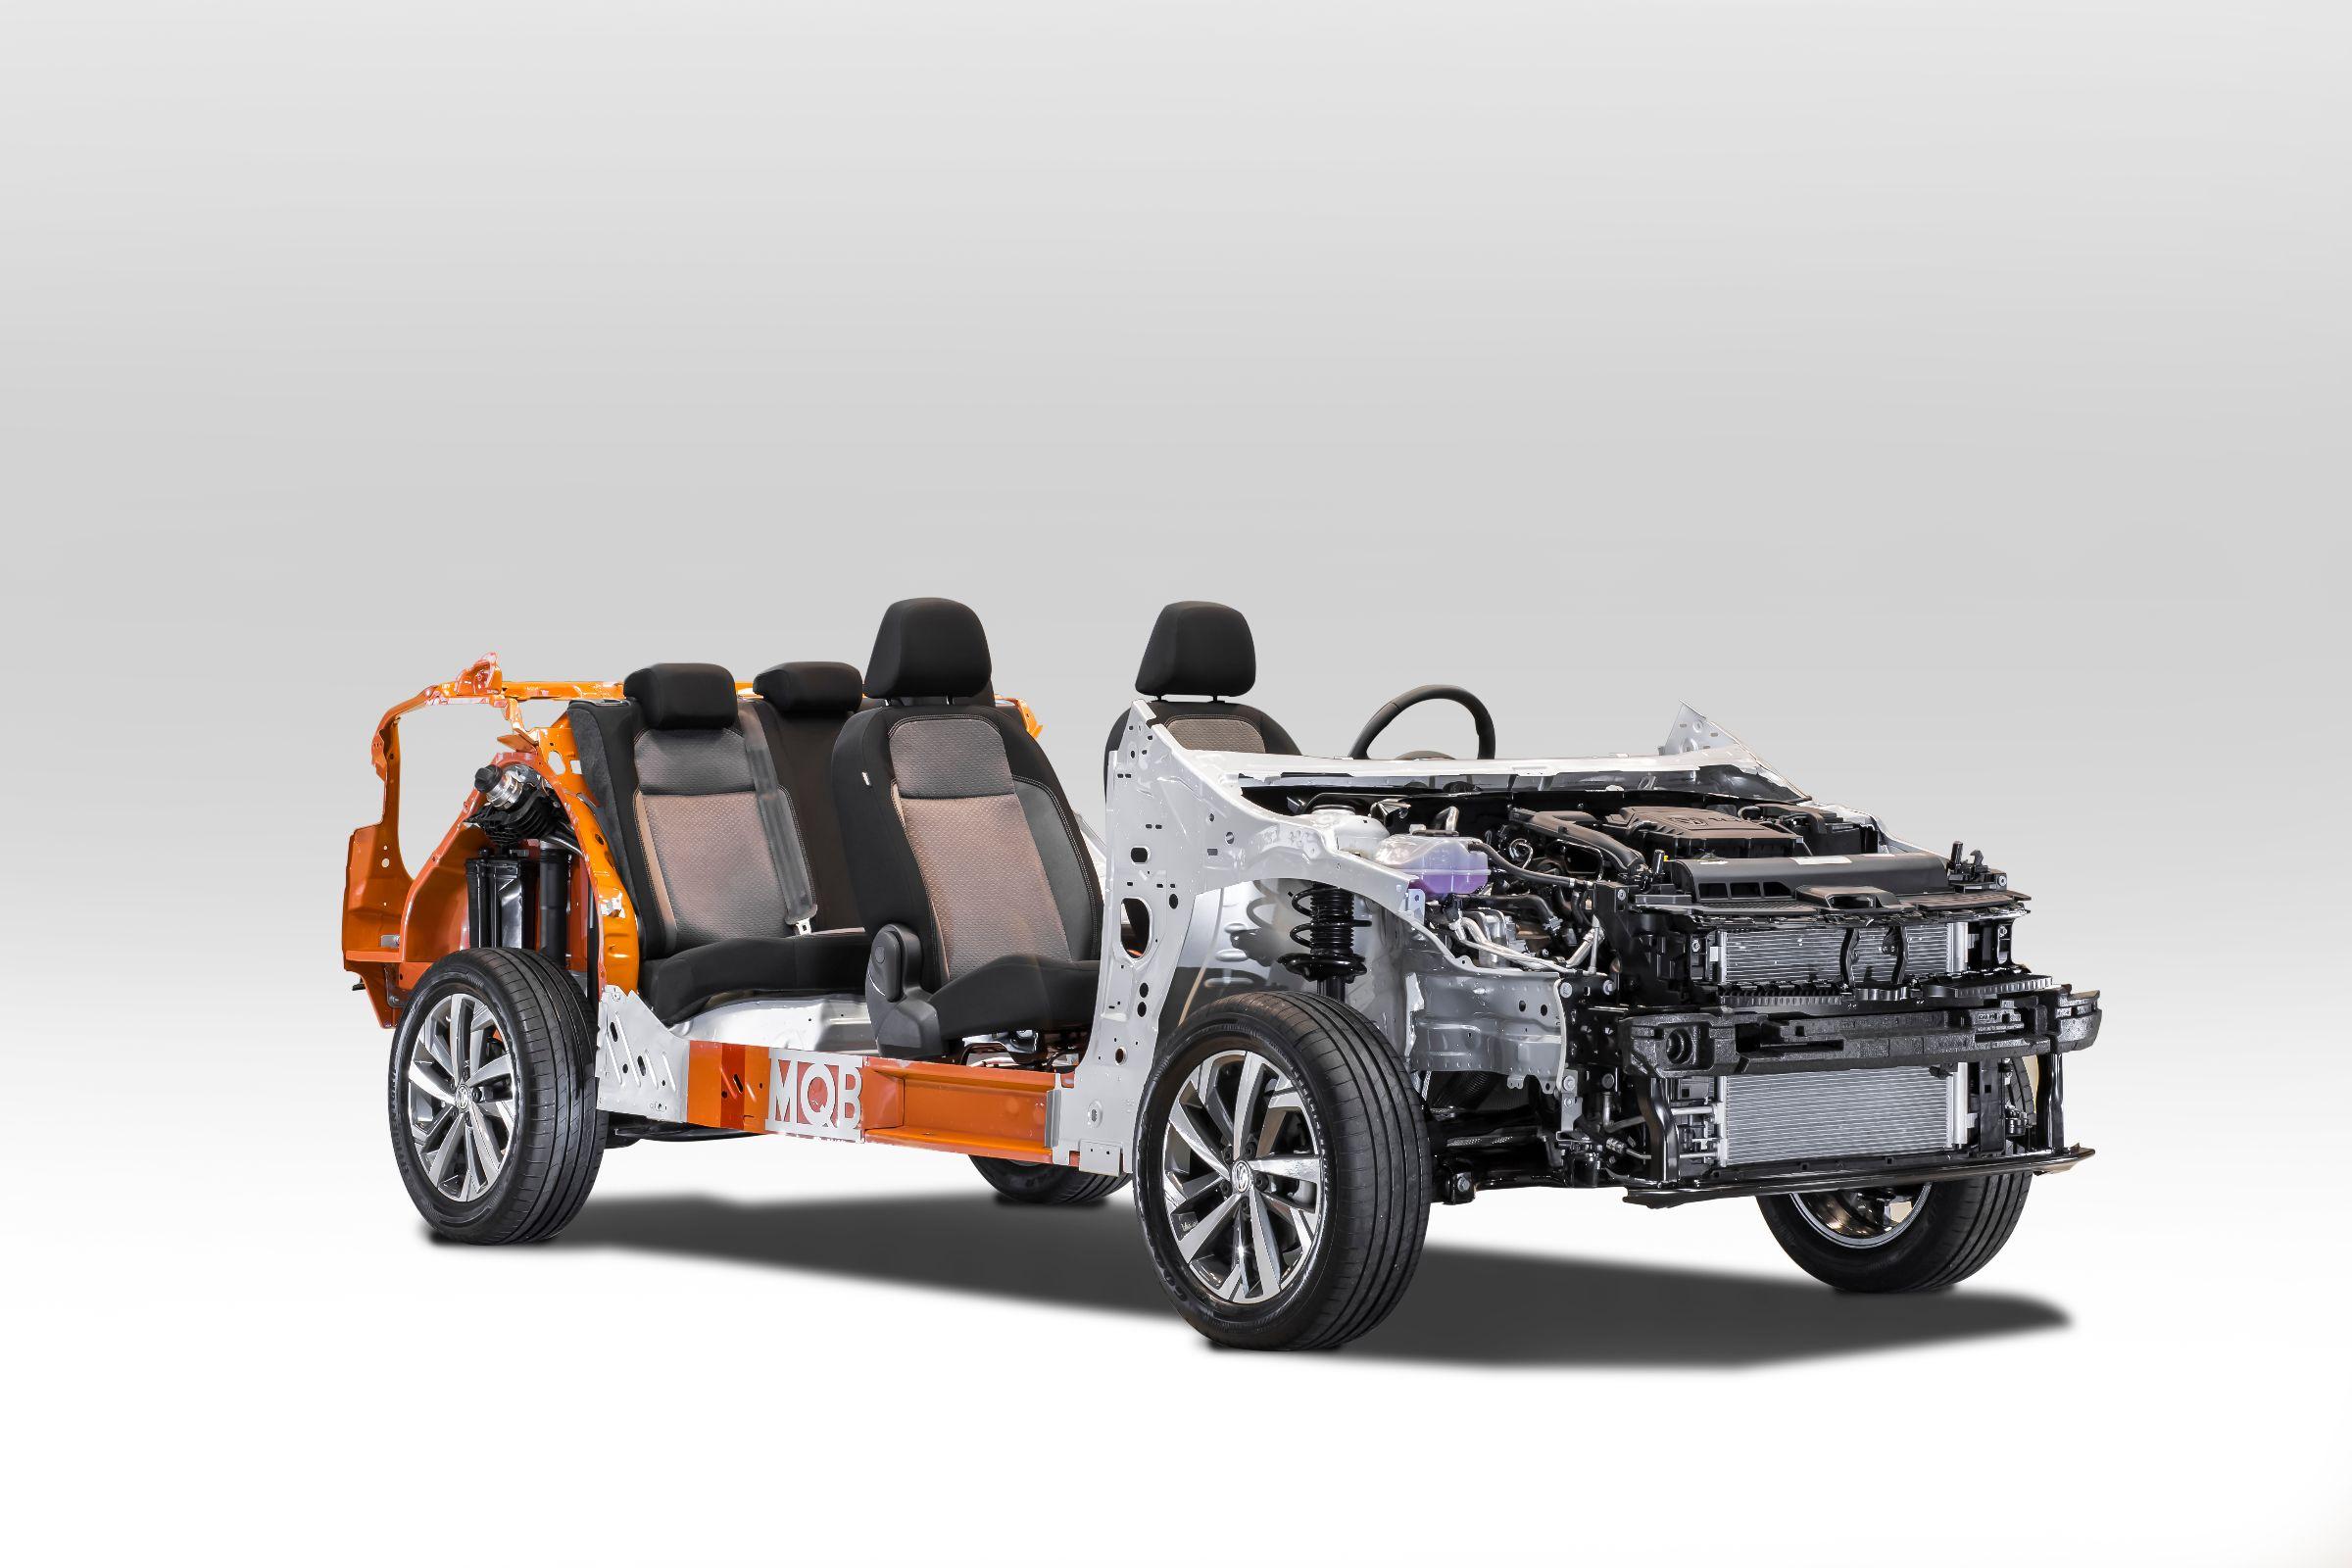 estrategia modular mqb 7 da Volkswagen, que serve de plataforma para o Virtus